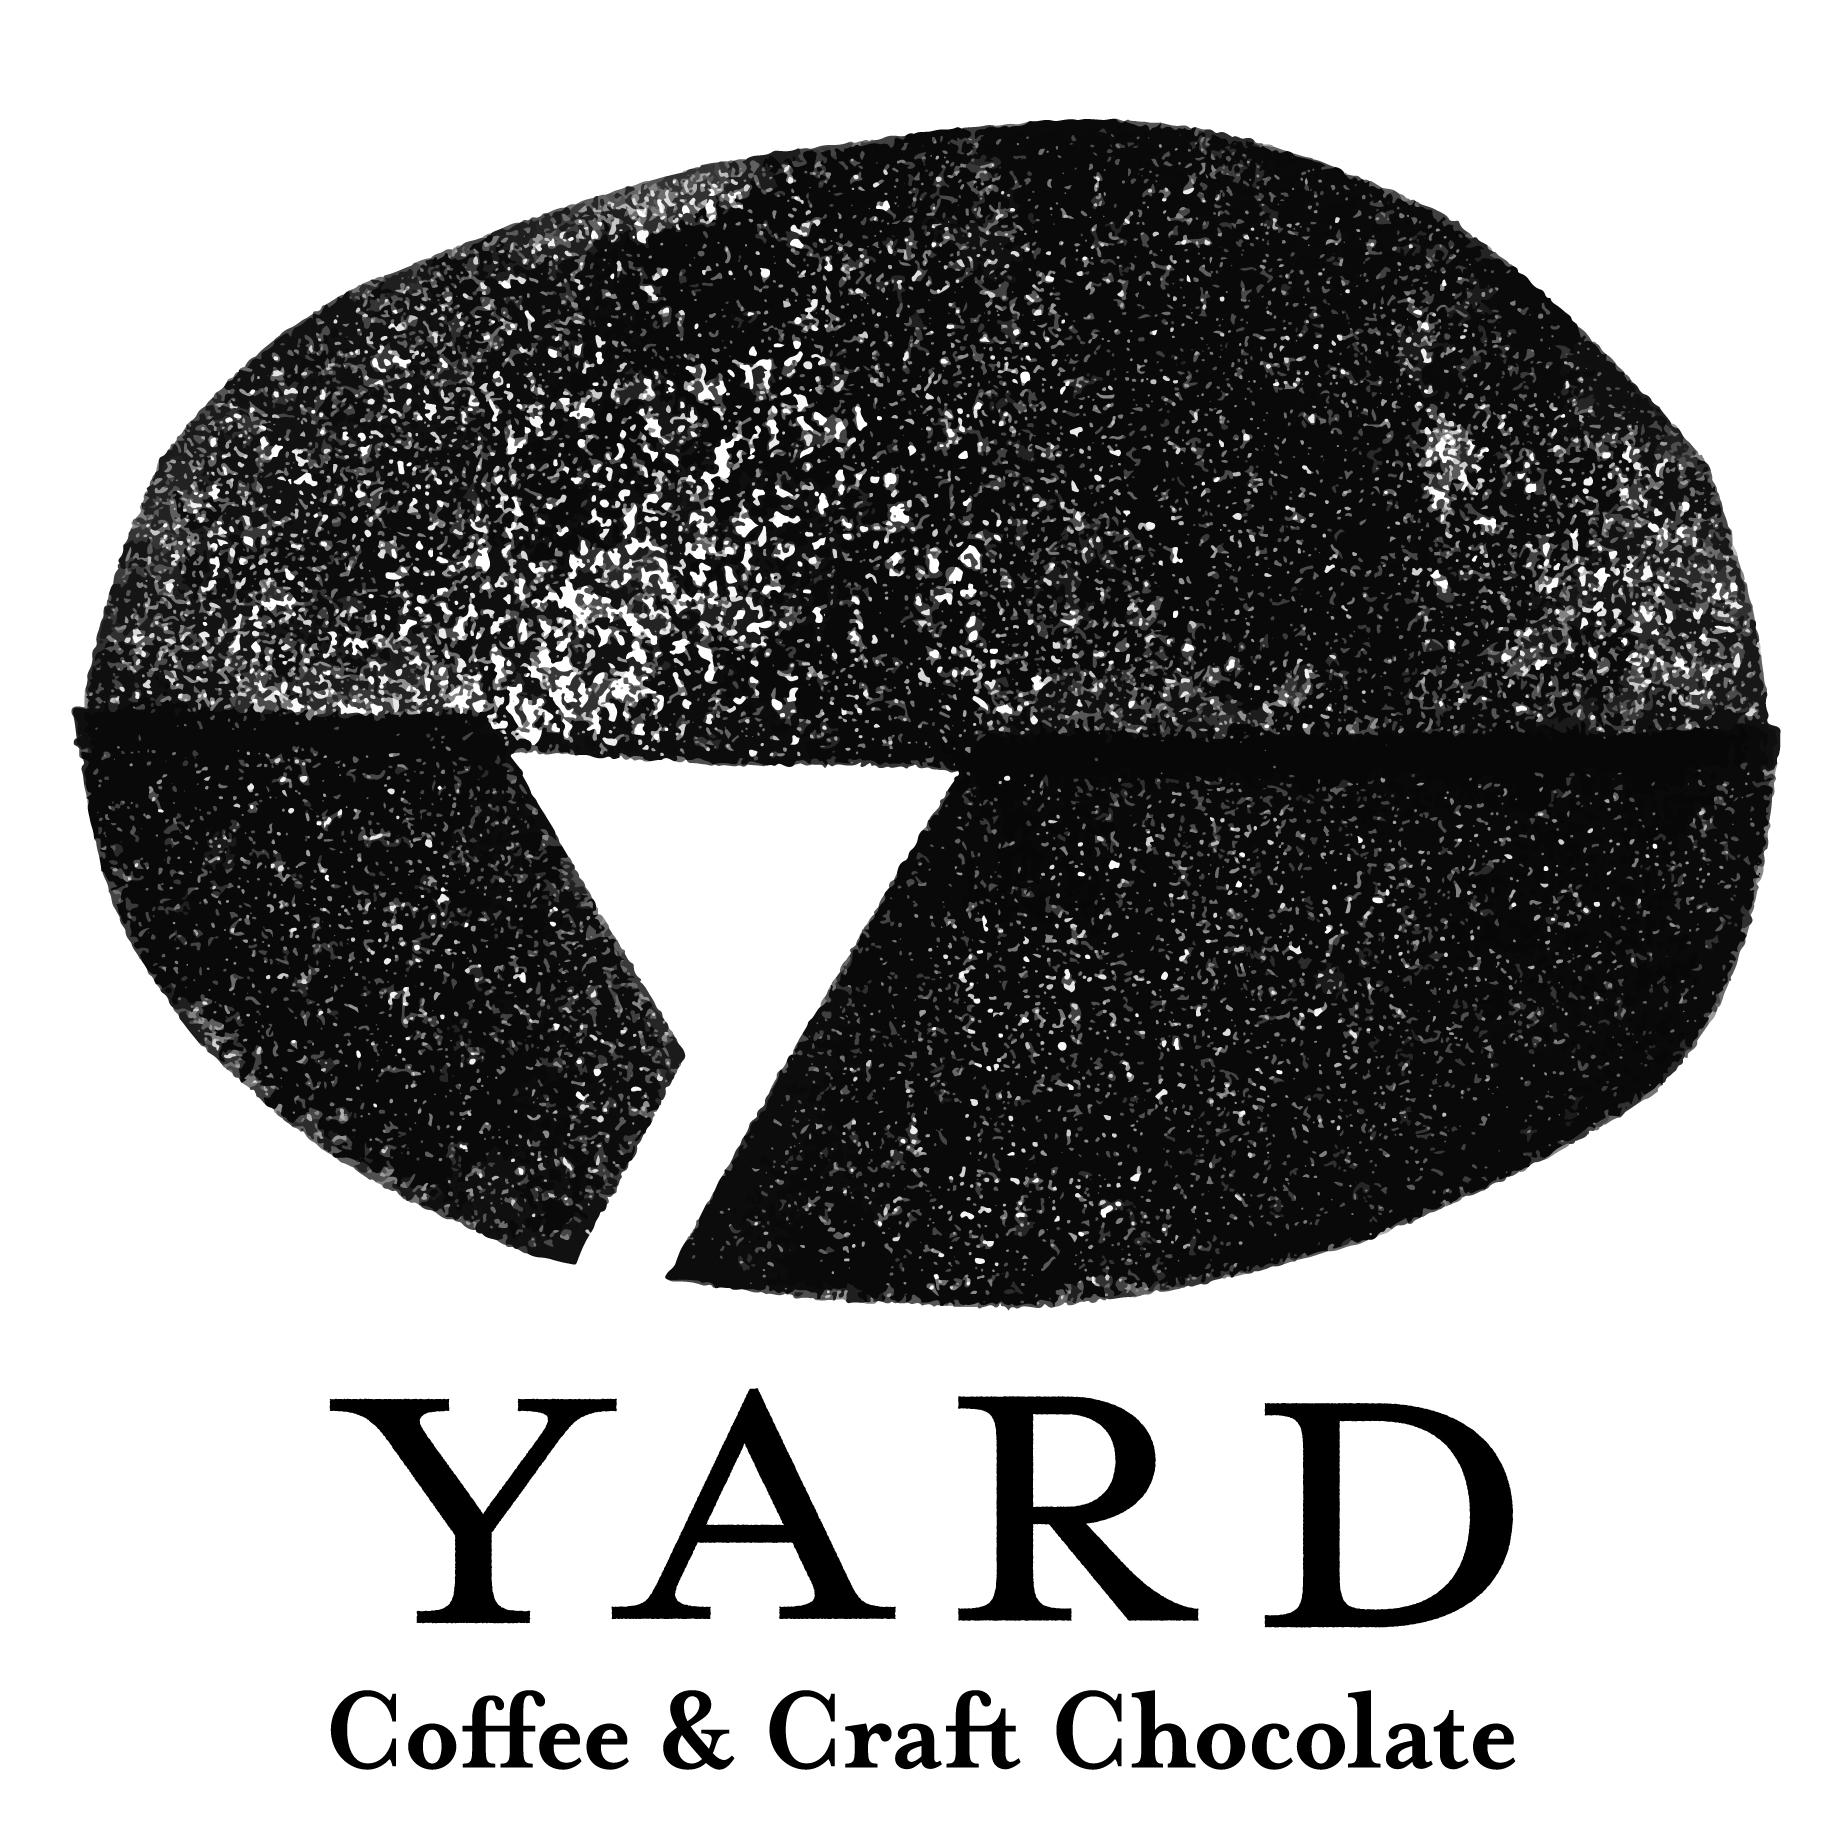 YARD Coffee and Craft Chocolete